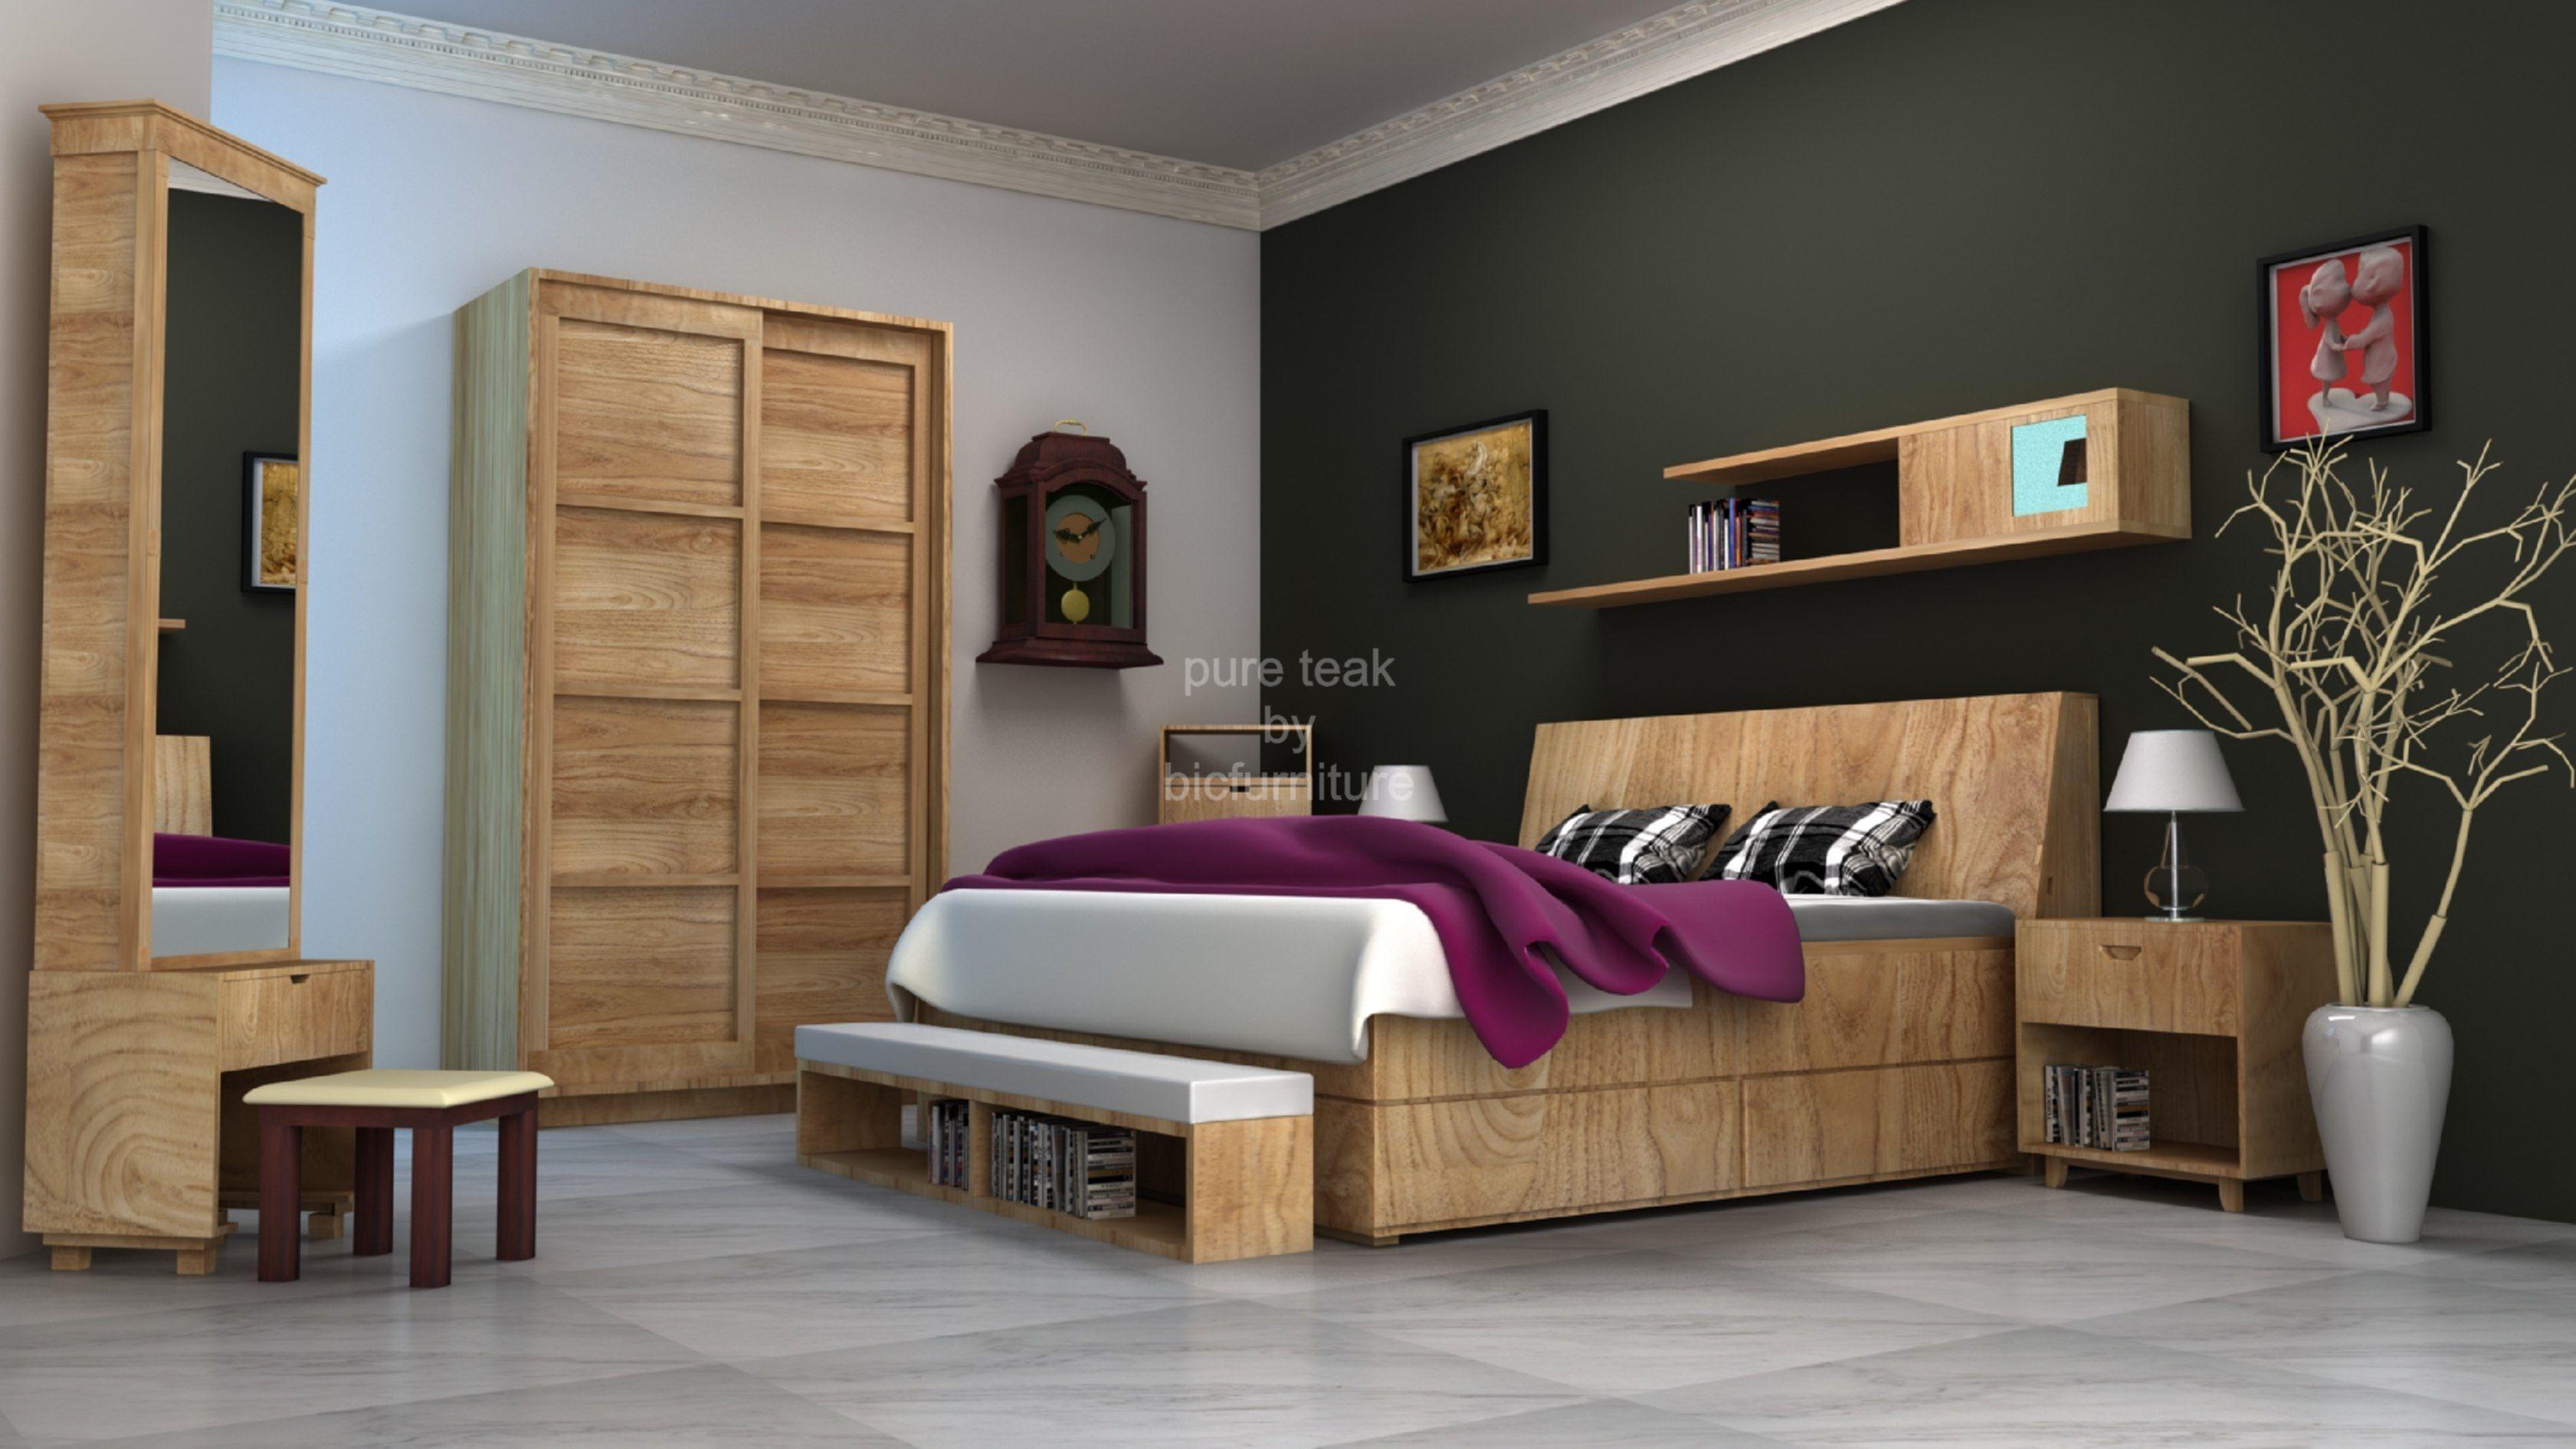 Full Bedroom Furniture Check More At Httpcasahomafull Unique Whole Bedroom Sets 2018